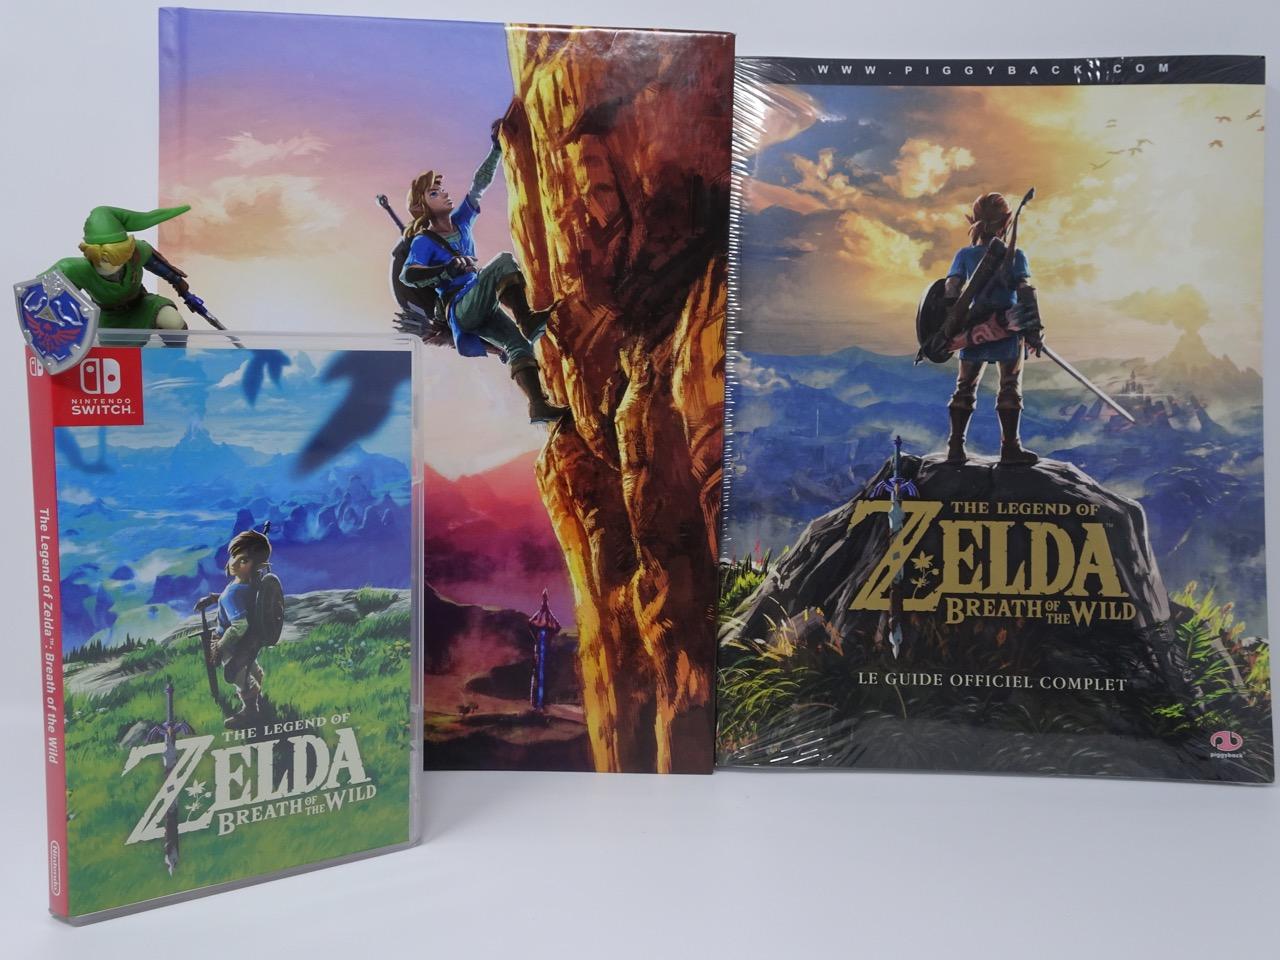 Livre Guide Officiel De Zelda Breath Of The Wild A Moi